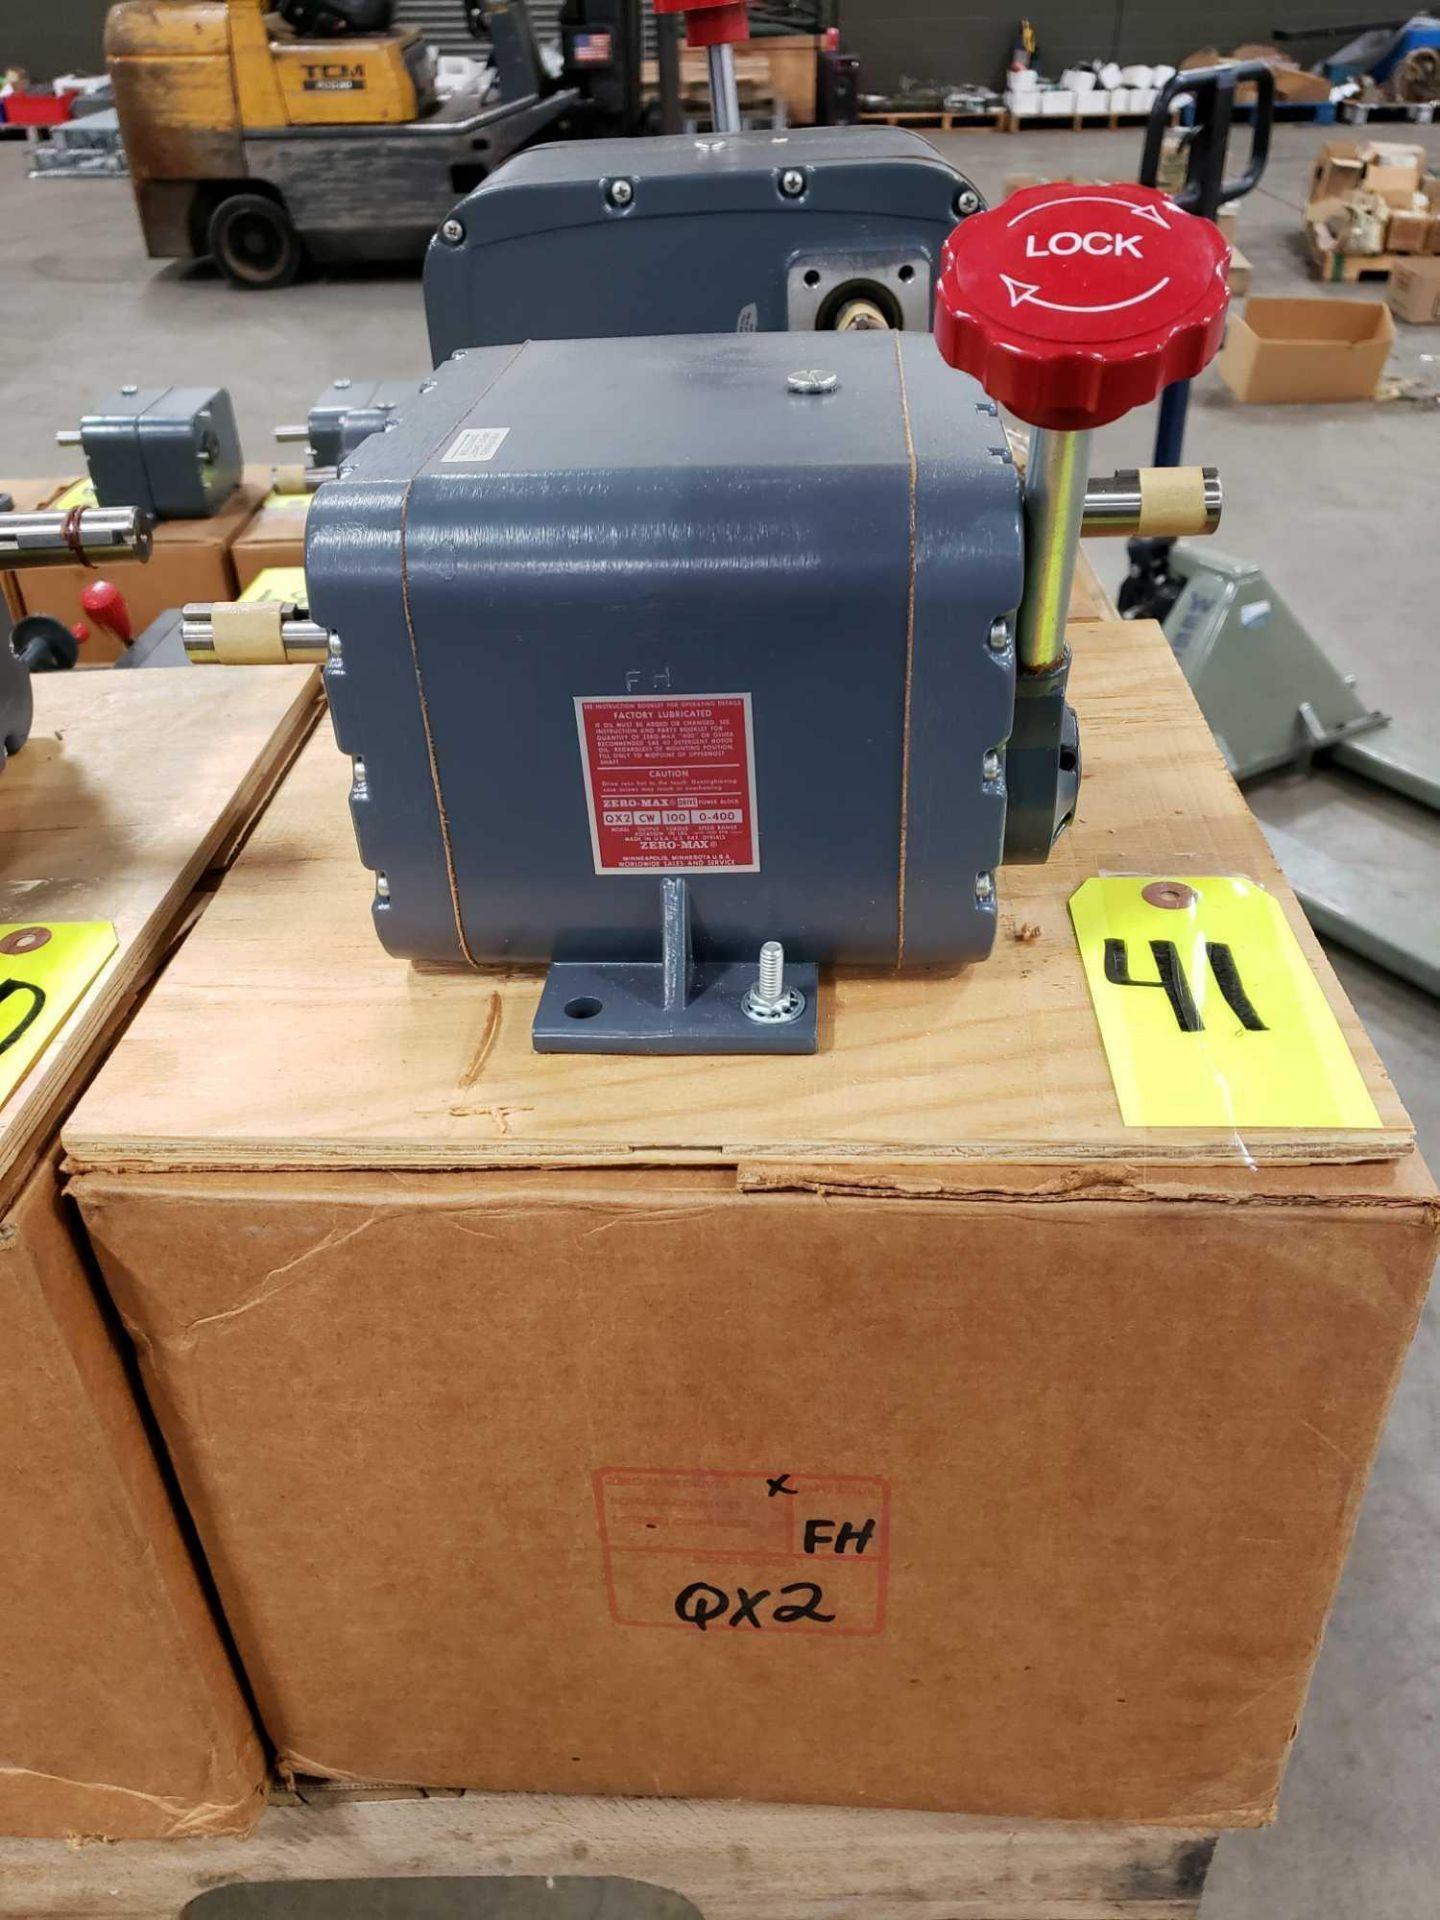 Lot 41 - Zero-max drive power block model QX2 CW output rotation, 100lb torque, 0-400 speed range. New.